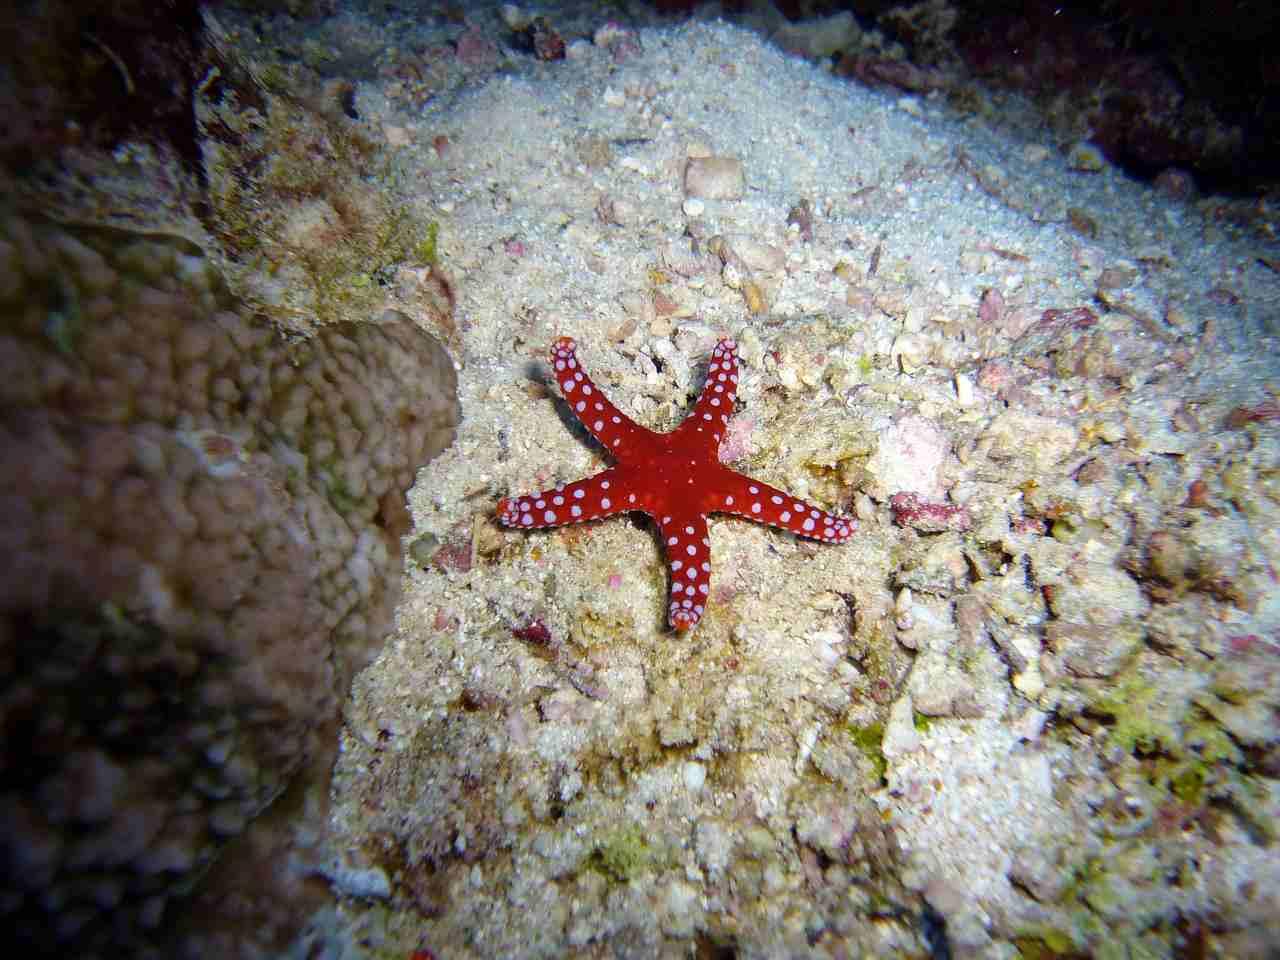 animali del Mediterraneo, la stella marina rossa